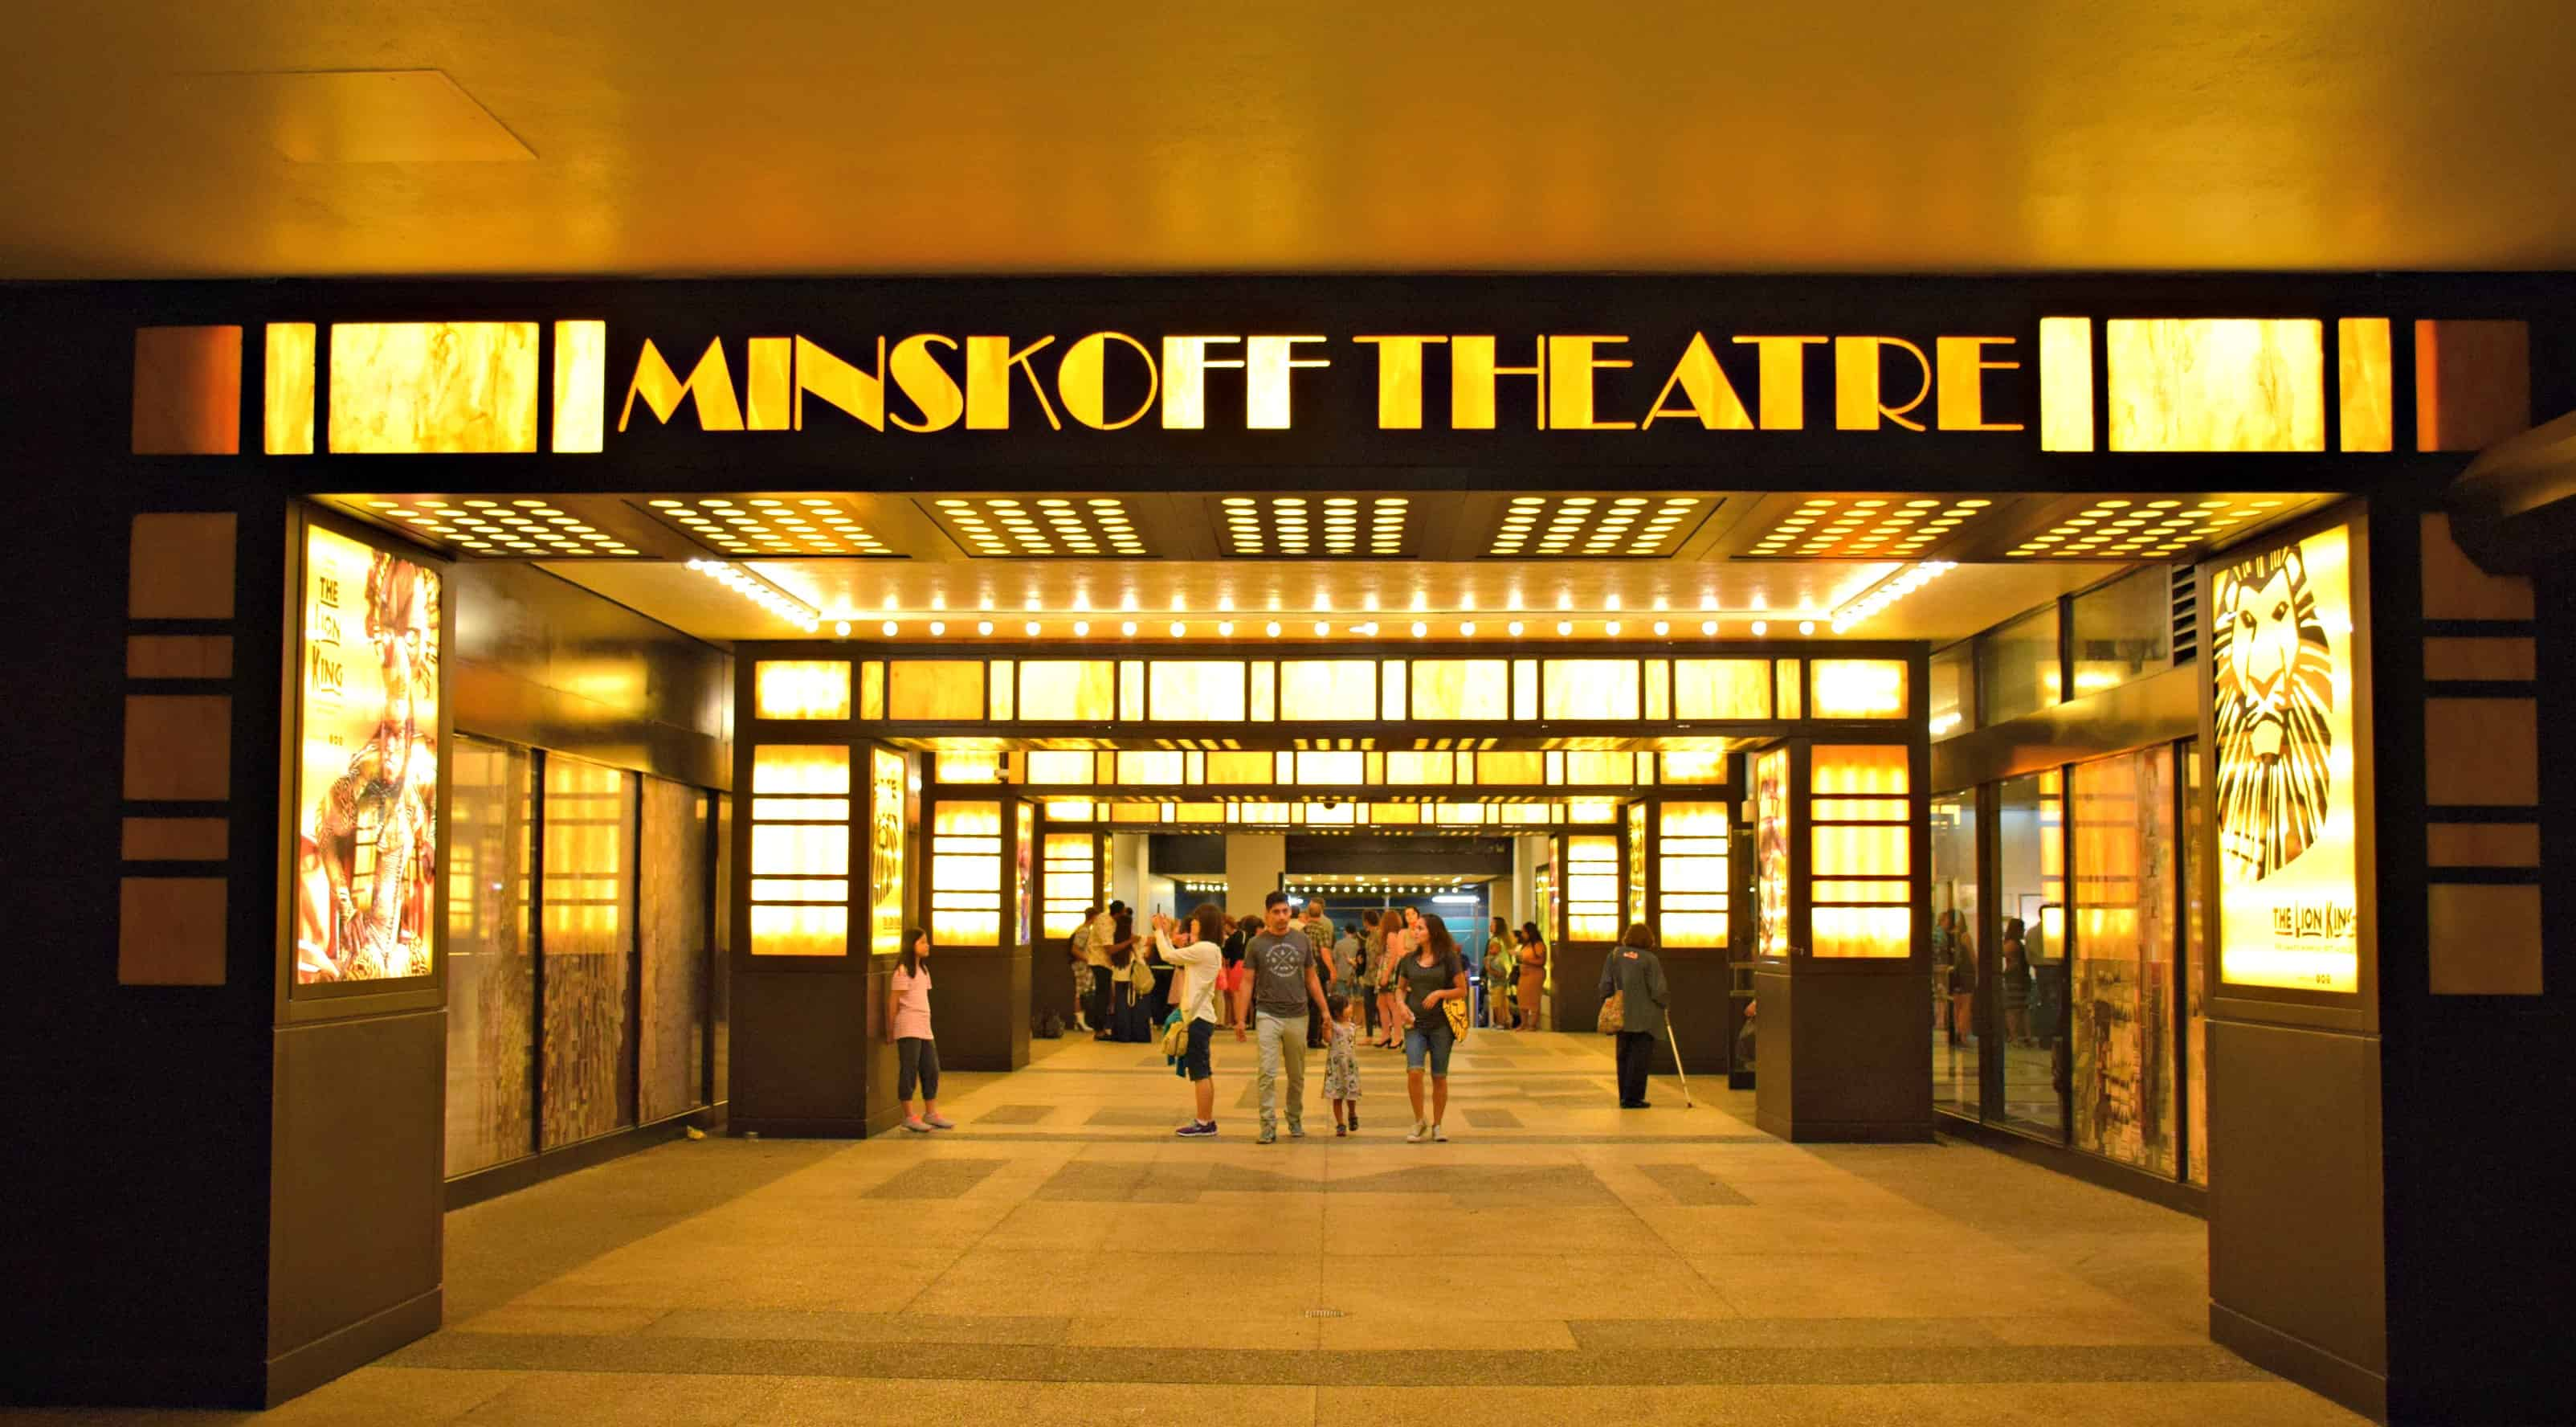 New York Minskoff Theater